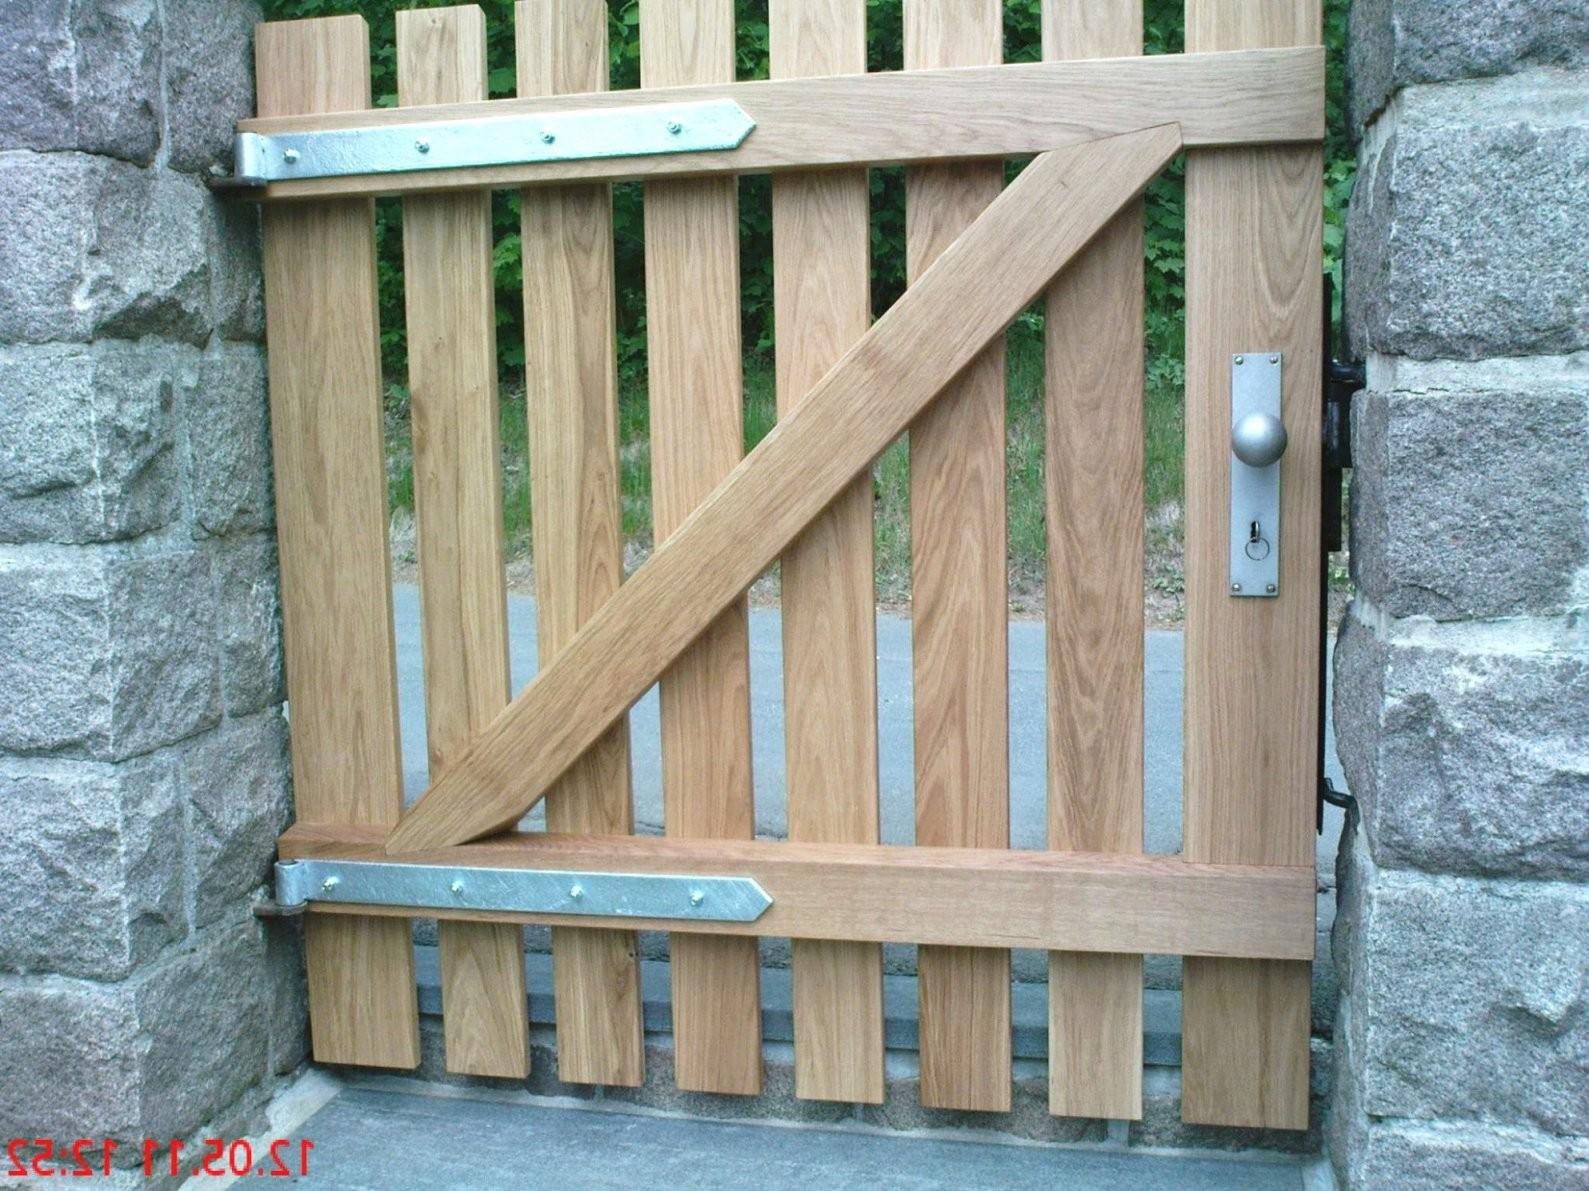 Gartentor Holz Selber Bauen Schön Hoftor Metall Selber Bauen Für von Gartentor Holz Selber Bauen Bild